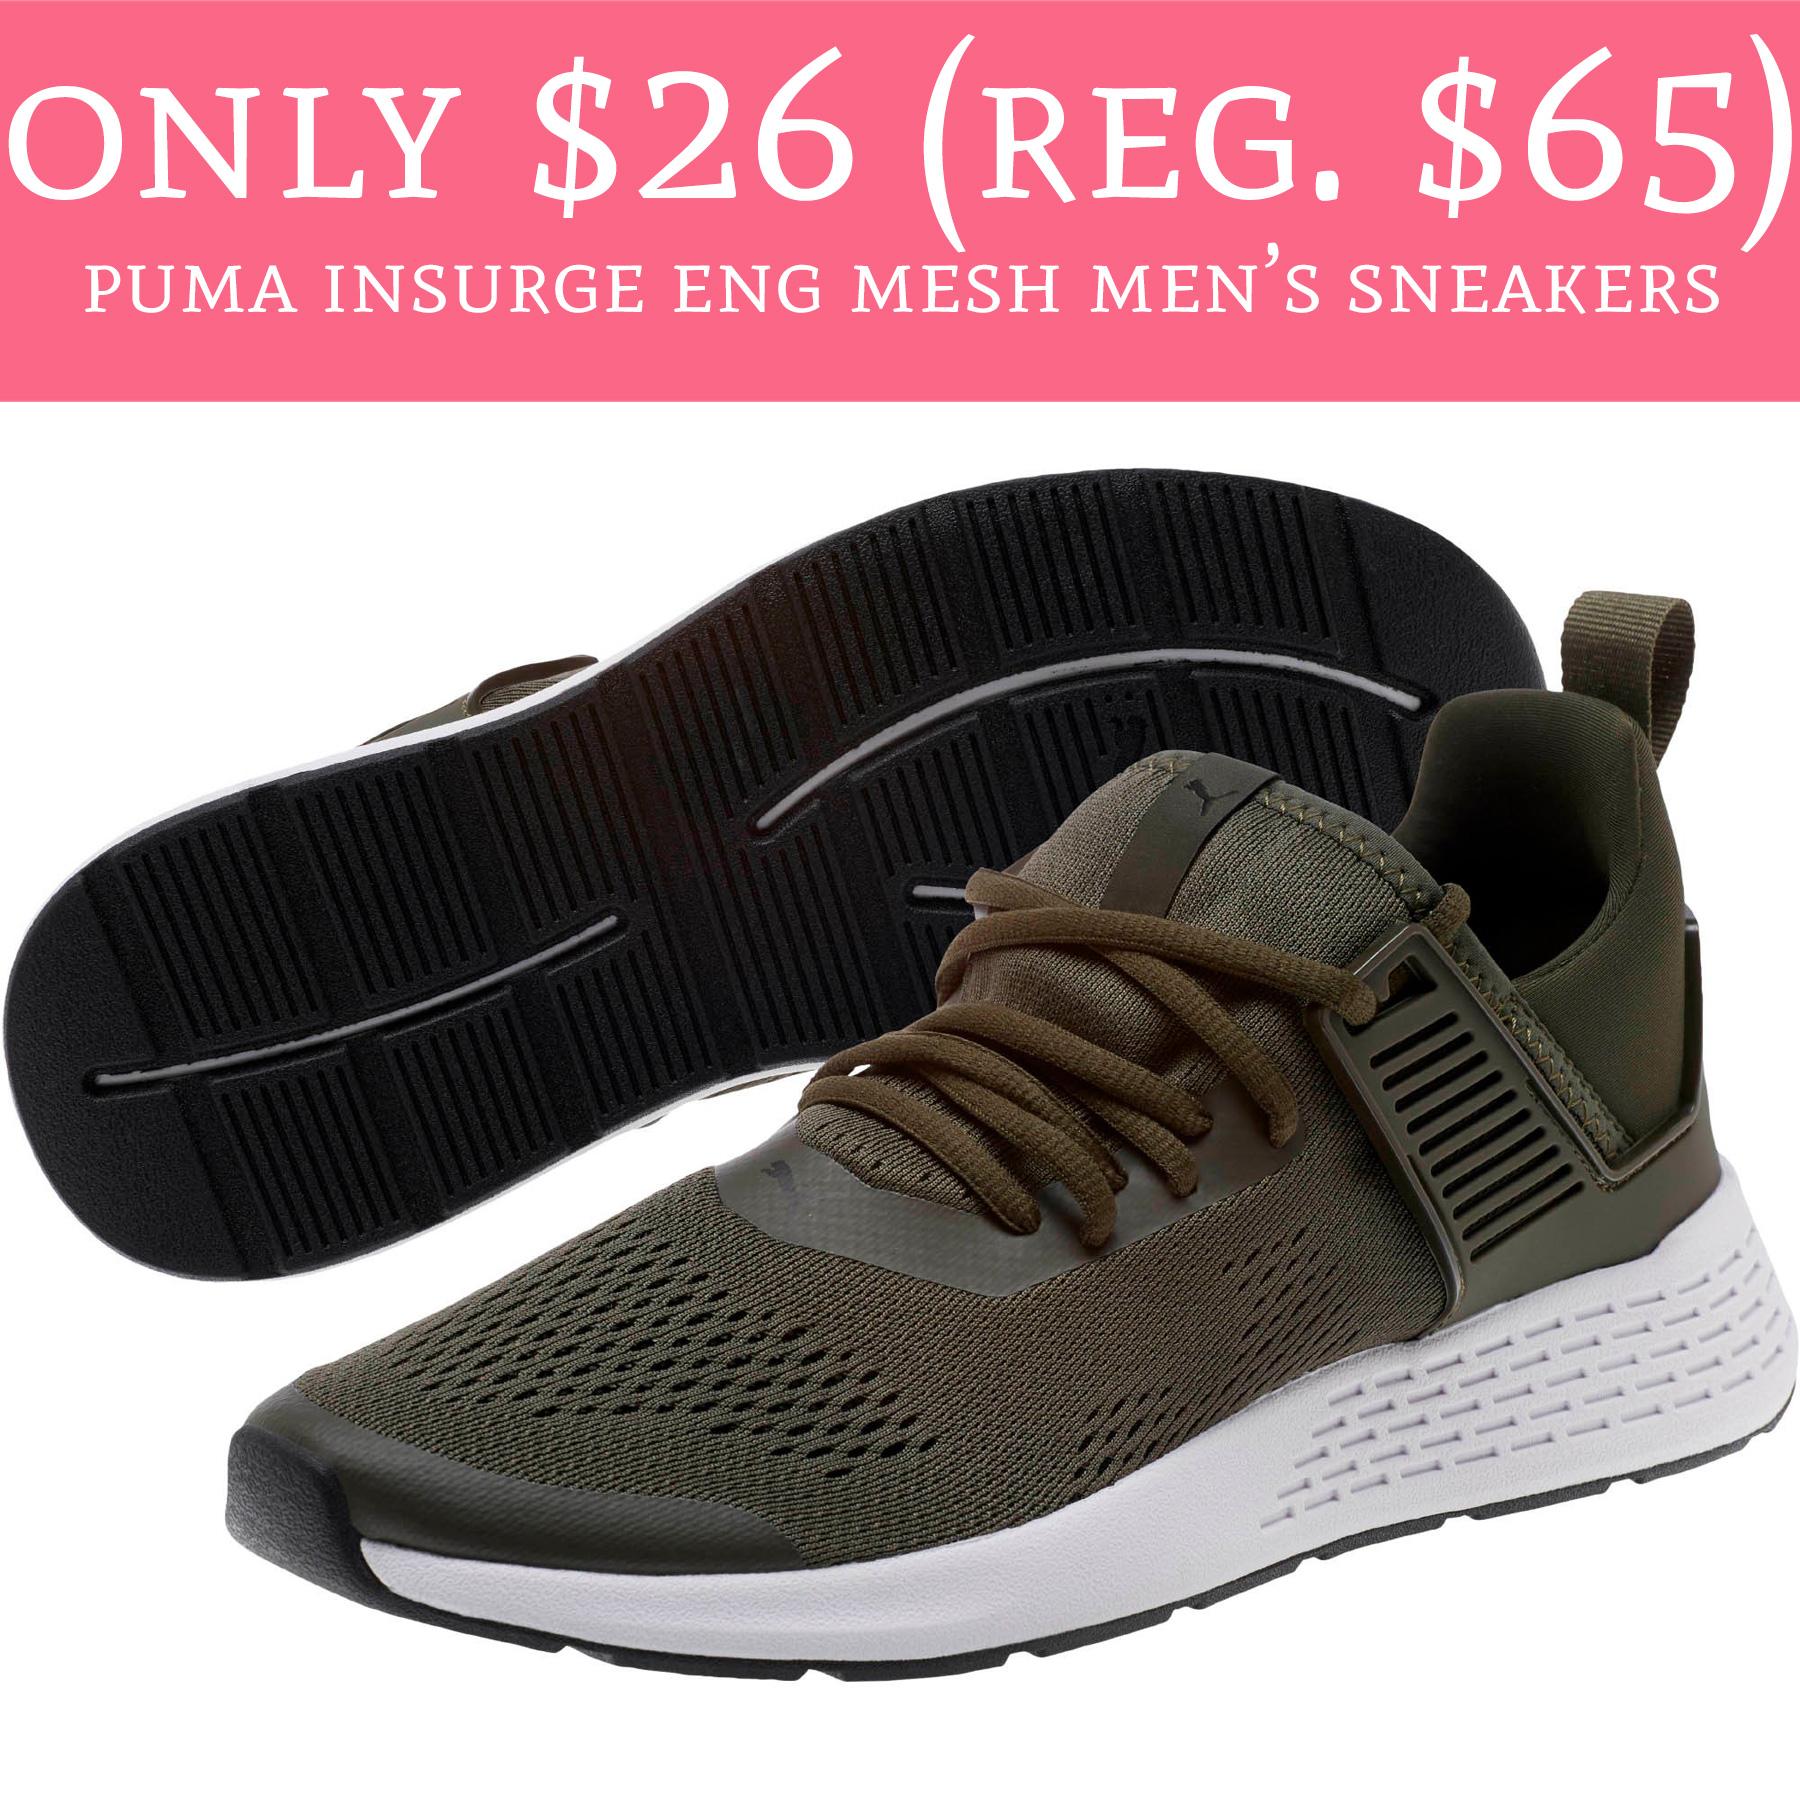 only  26  reg   65  puma insurge eng mesh men u0026 39 s sneakers